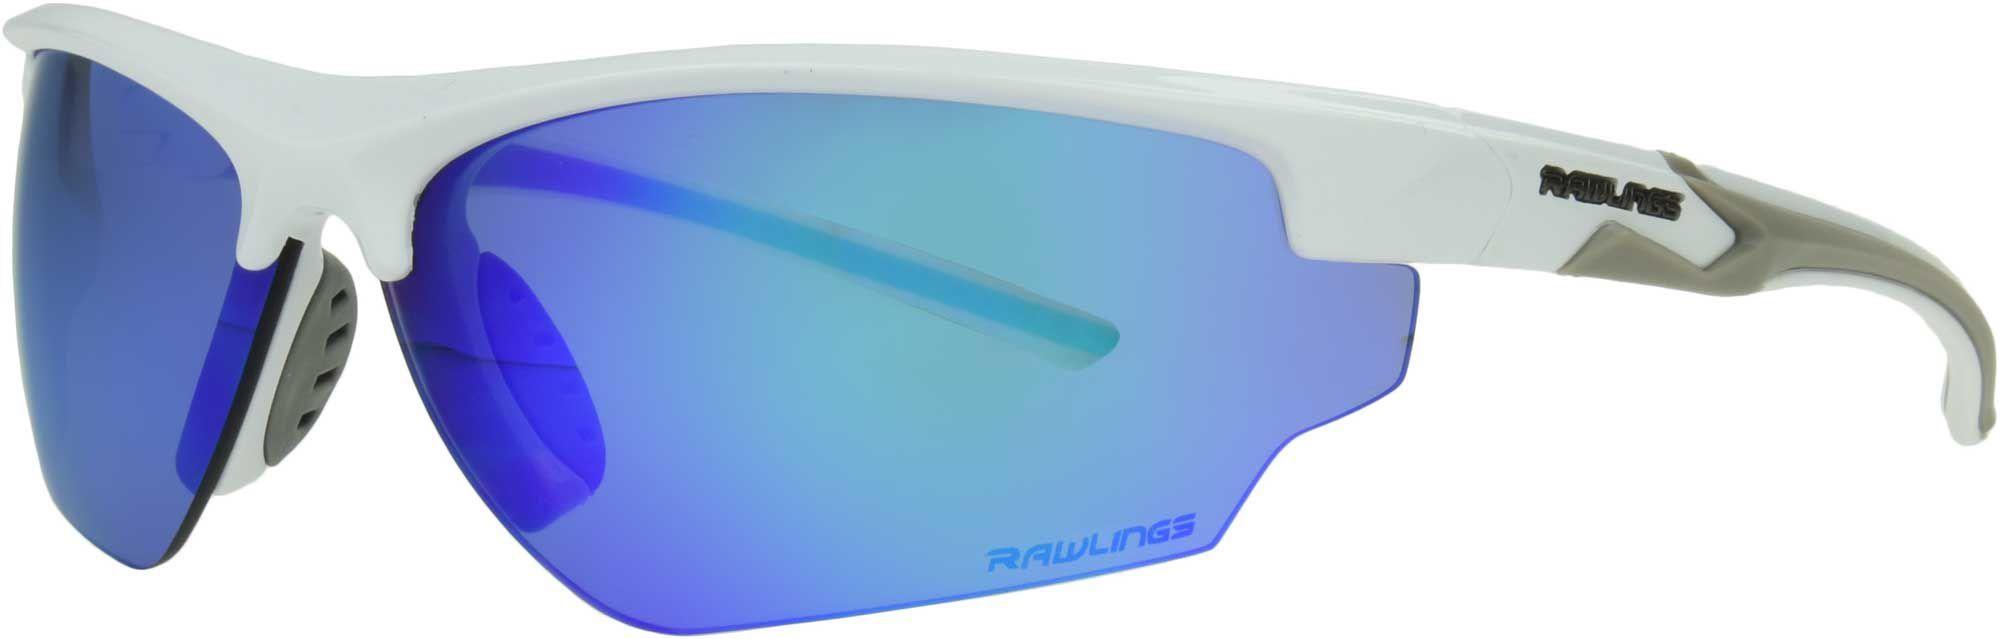 8ac27818c899e Rawlings Youth 1903 Baseball Sunglasses in 2019